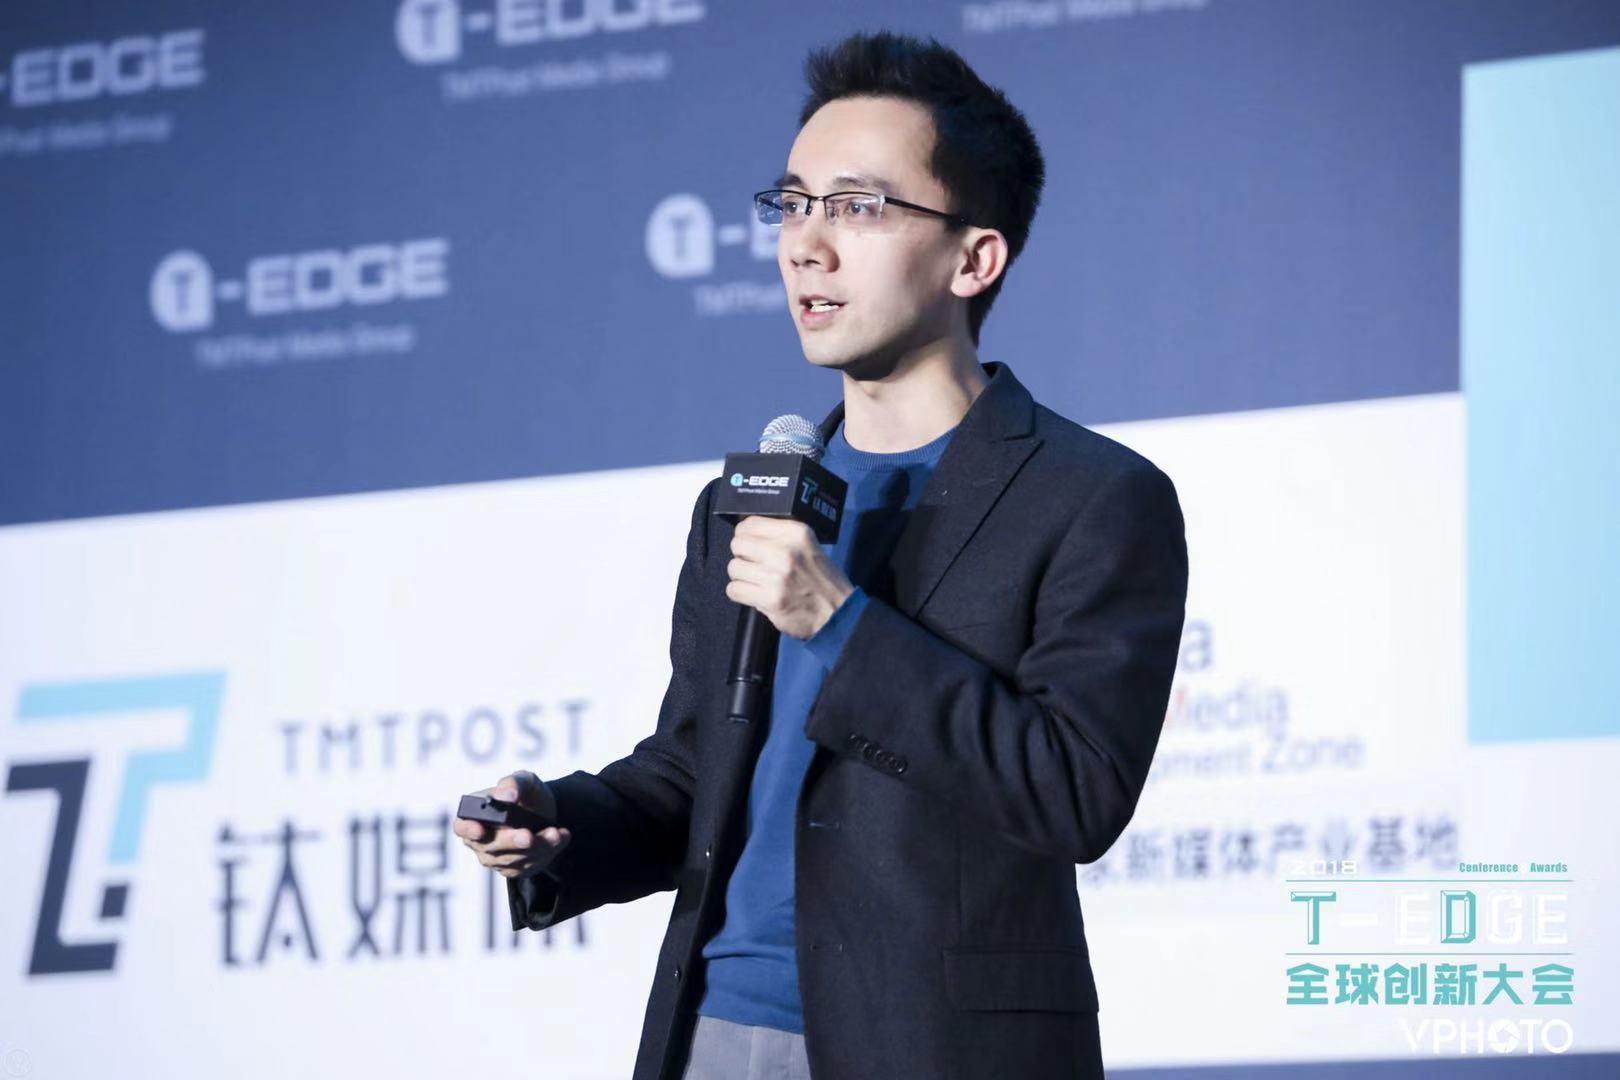 Auto X 肖健雄:无人驾驶技术将持续推动运力成本下降,支撑多产业发展 | 2018 T-EDGE